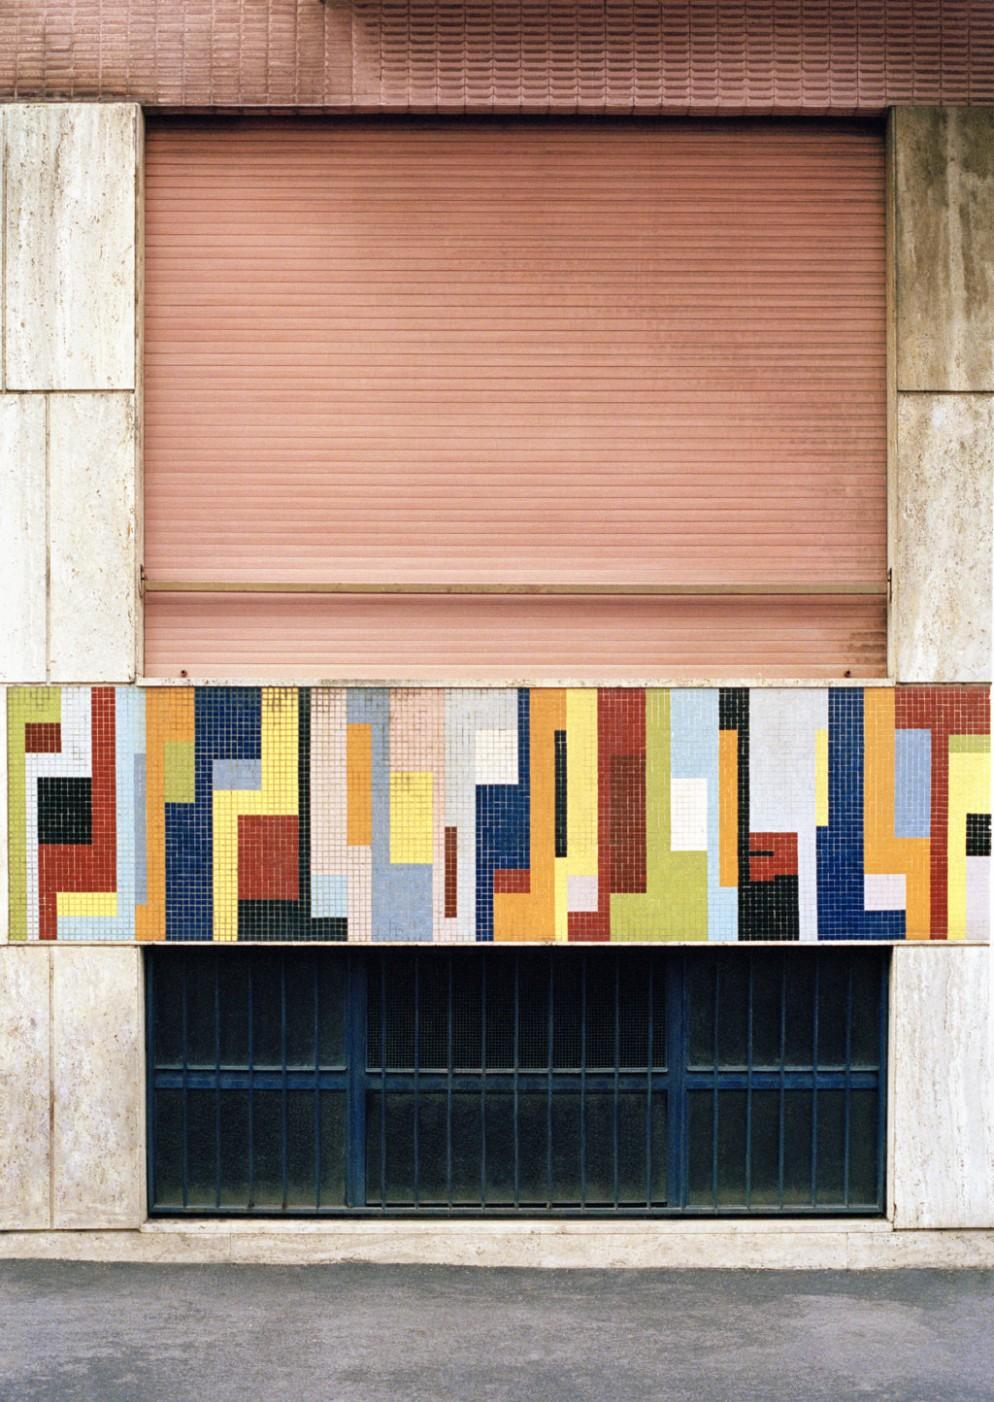 milano-architettura- 006 -ph_stefan-giftthaler-livingcorriere